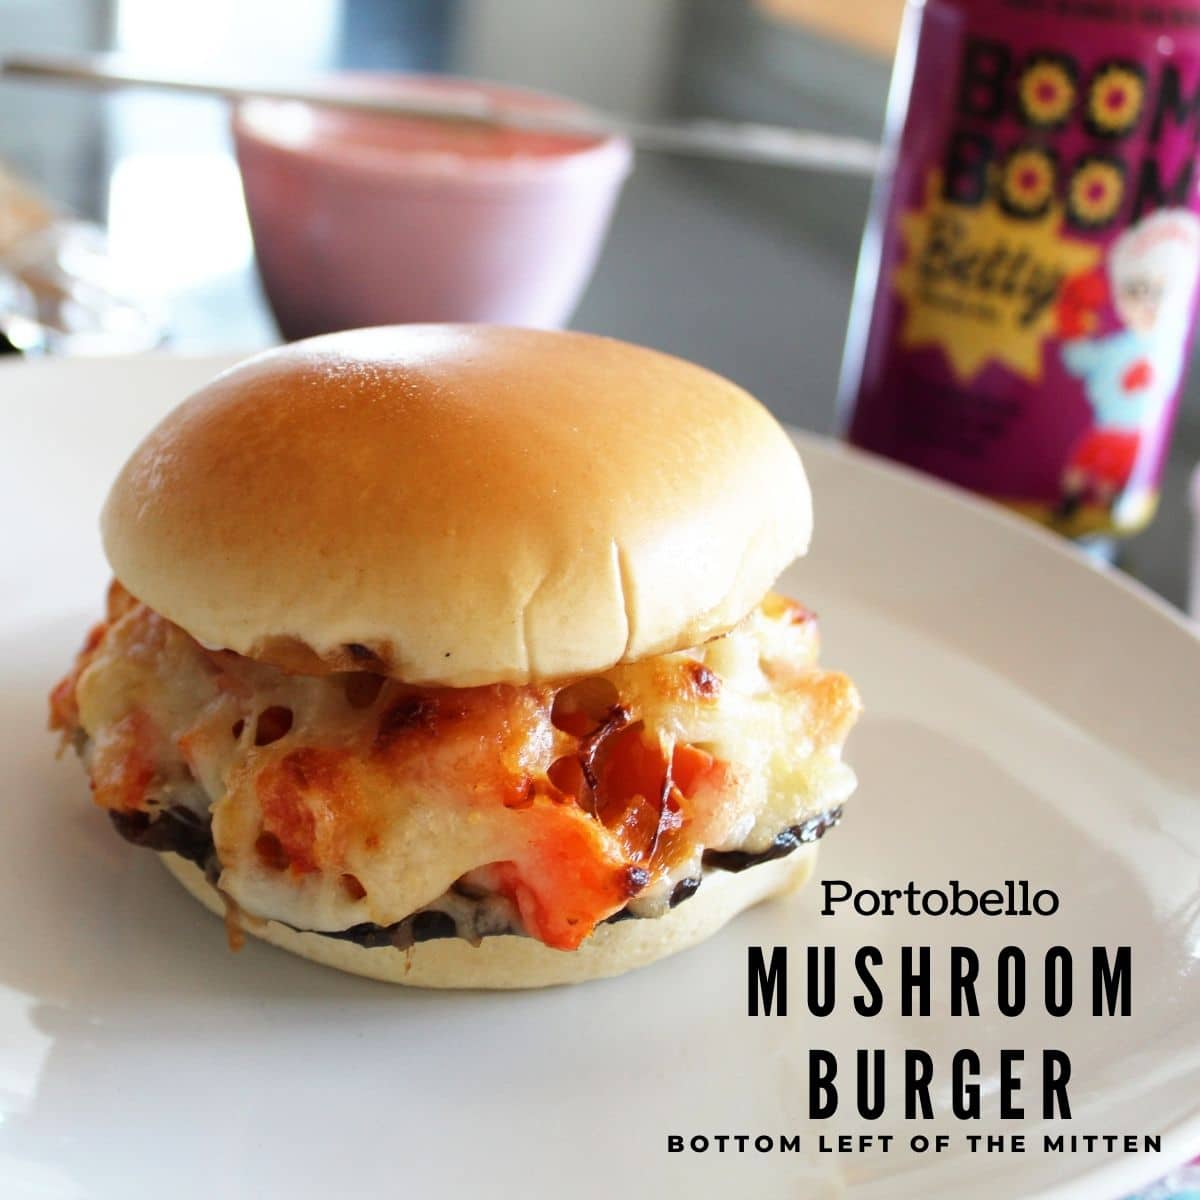 side shot of a portobello mushroom burger recipe with descriptive text overlay.